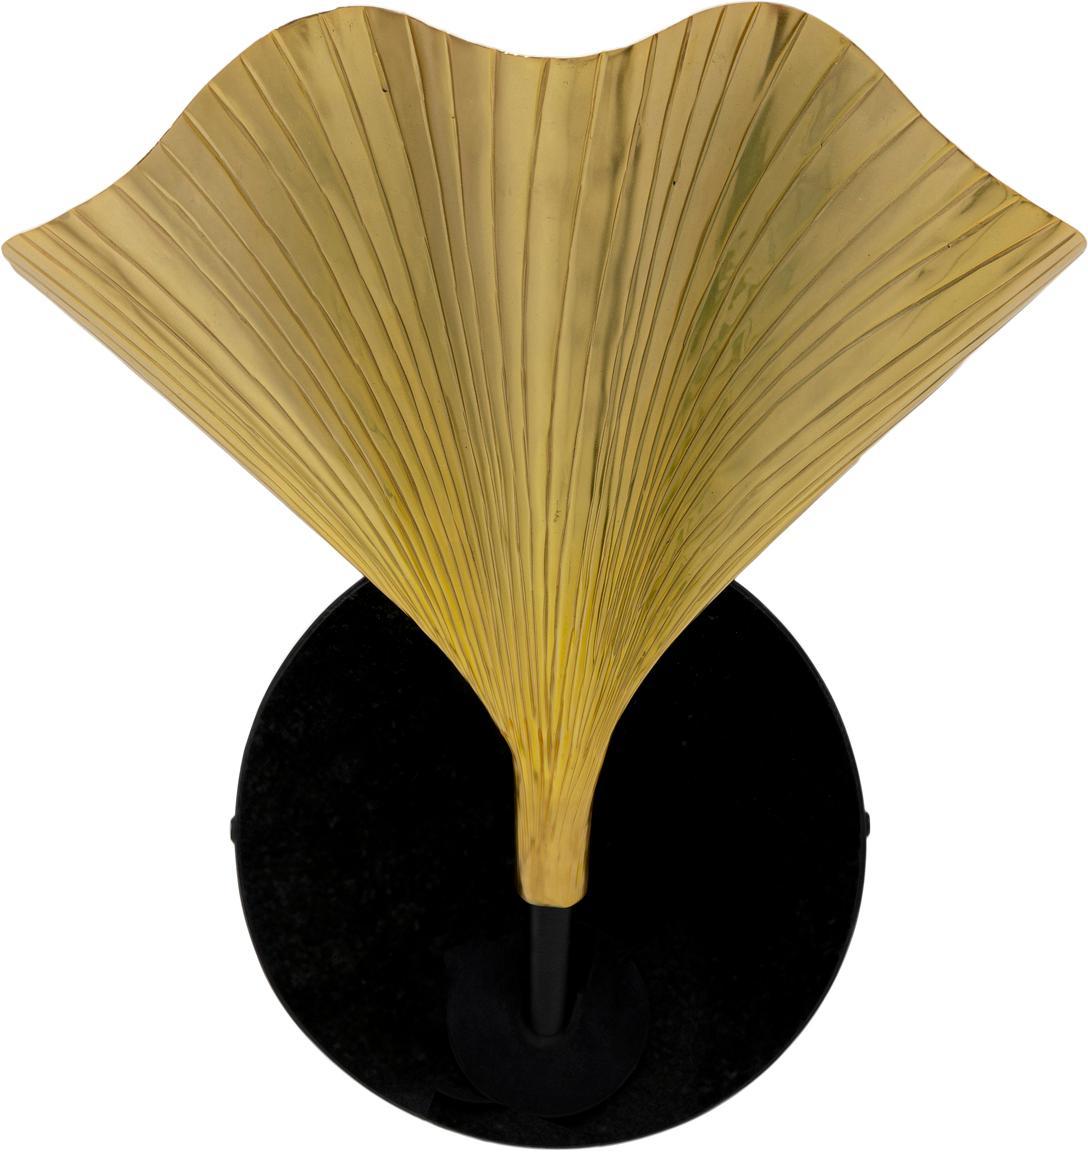 Wandleuchte Ginkgo mit Marmorbefestigung, Lampenschirm: Aluminium, lackiert, Gold, Schwarz, 30 x 33 cm